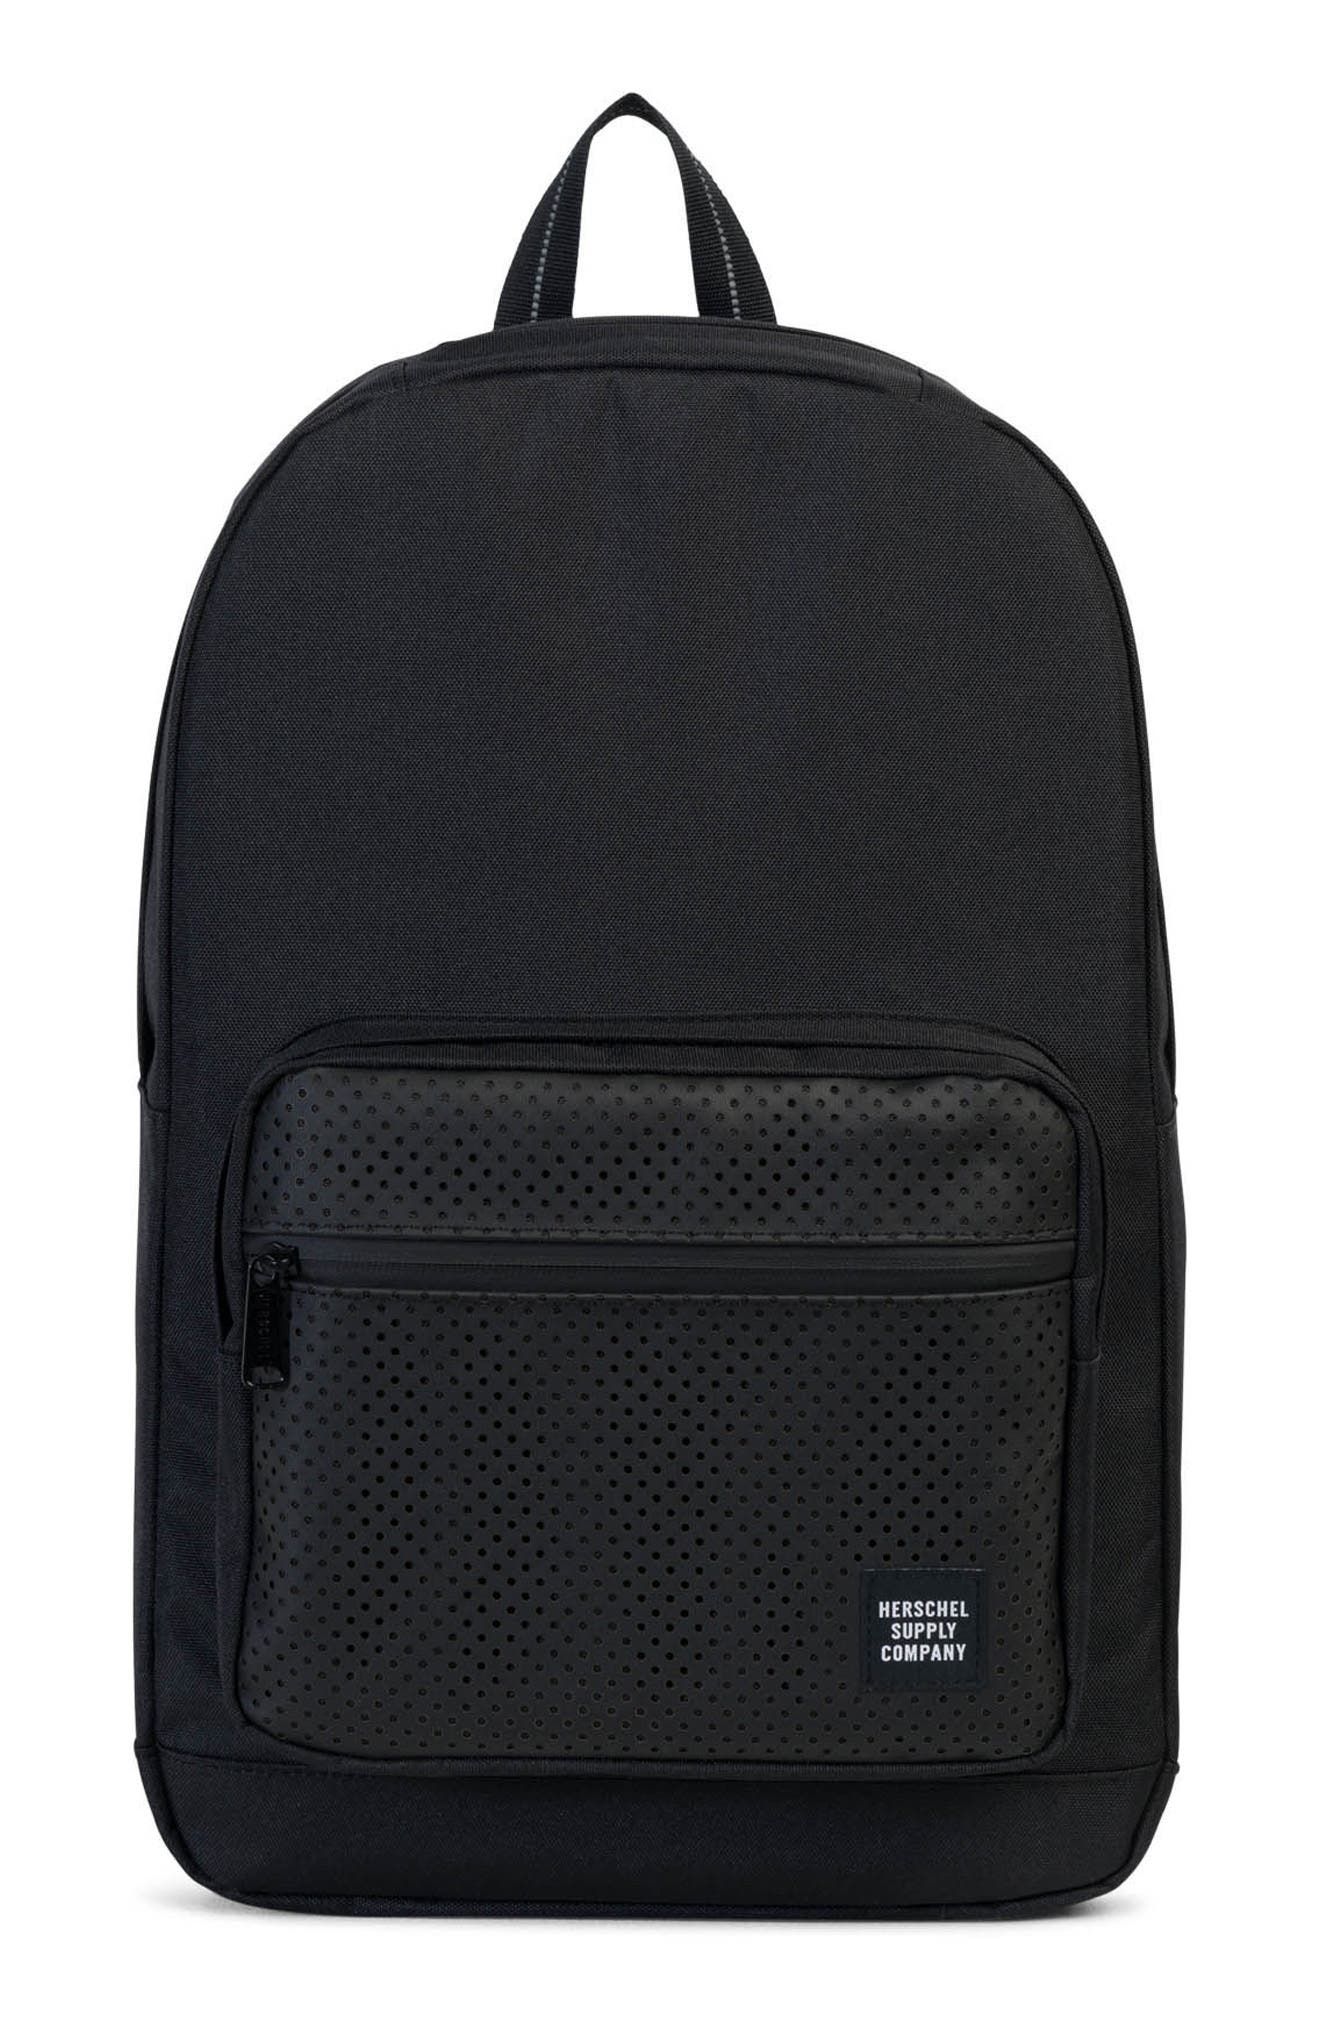 Alternate Image 1 Selected - Herschel Supply Co. Pop Quiz Aspect Backpack